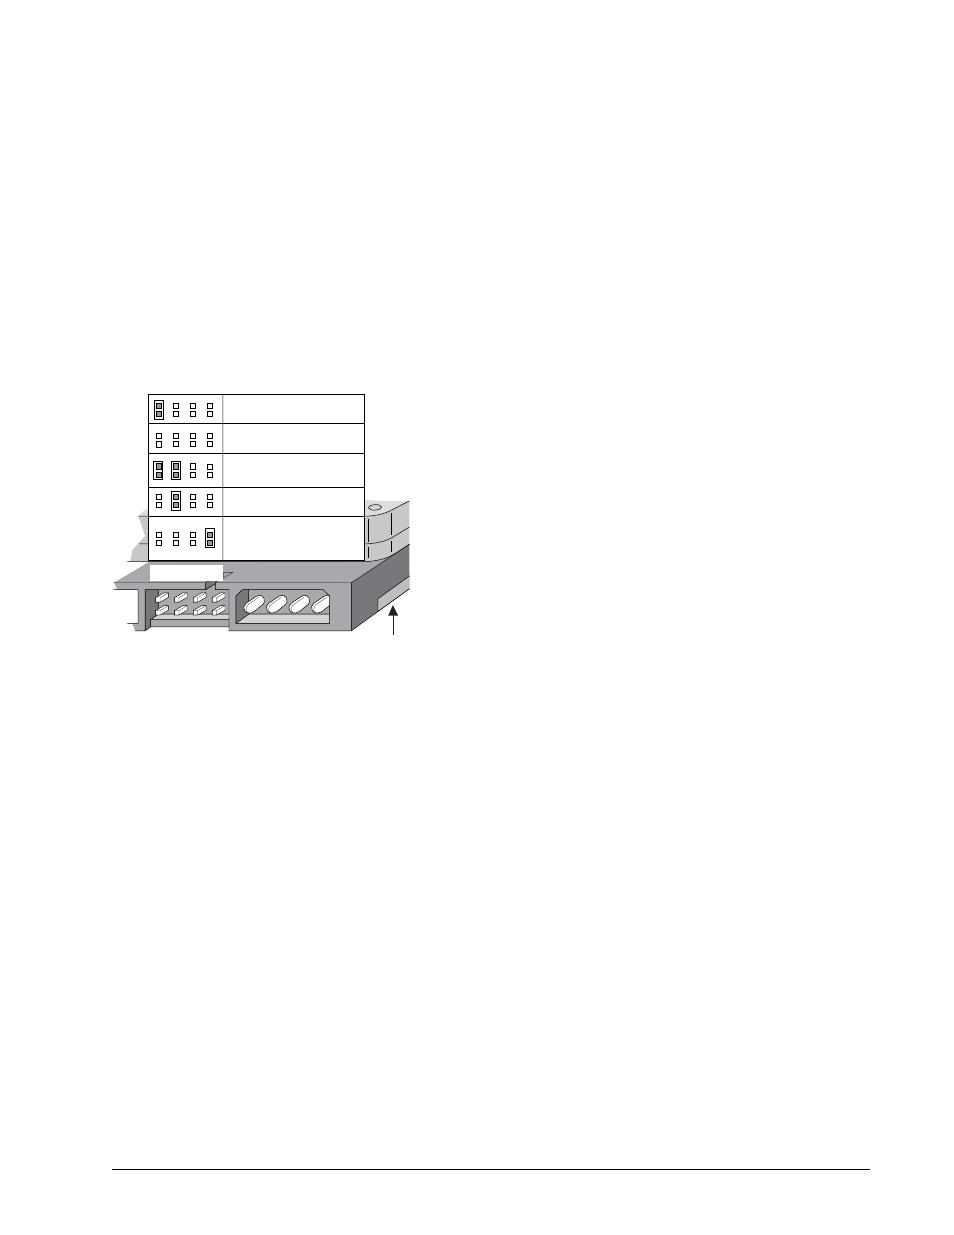 2 breather filter hole precautions | seagate barracuda st3120022a.